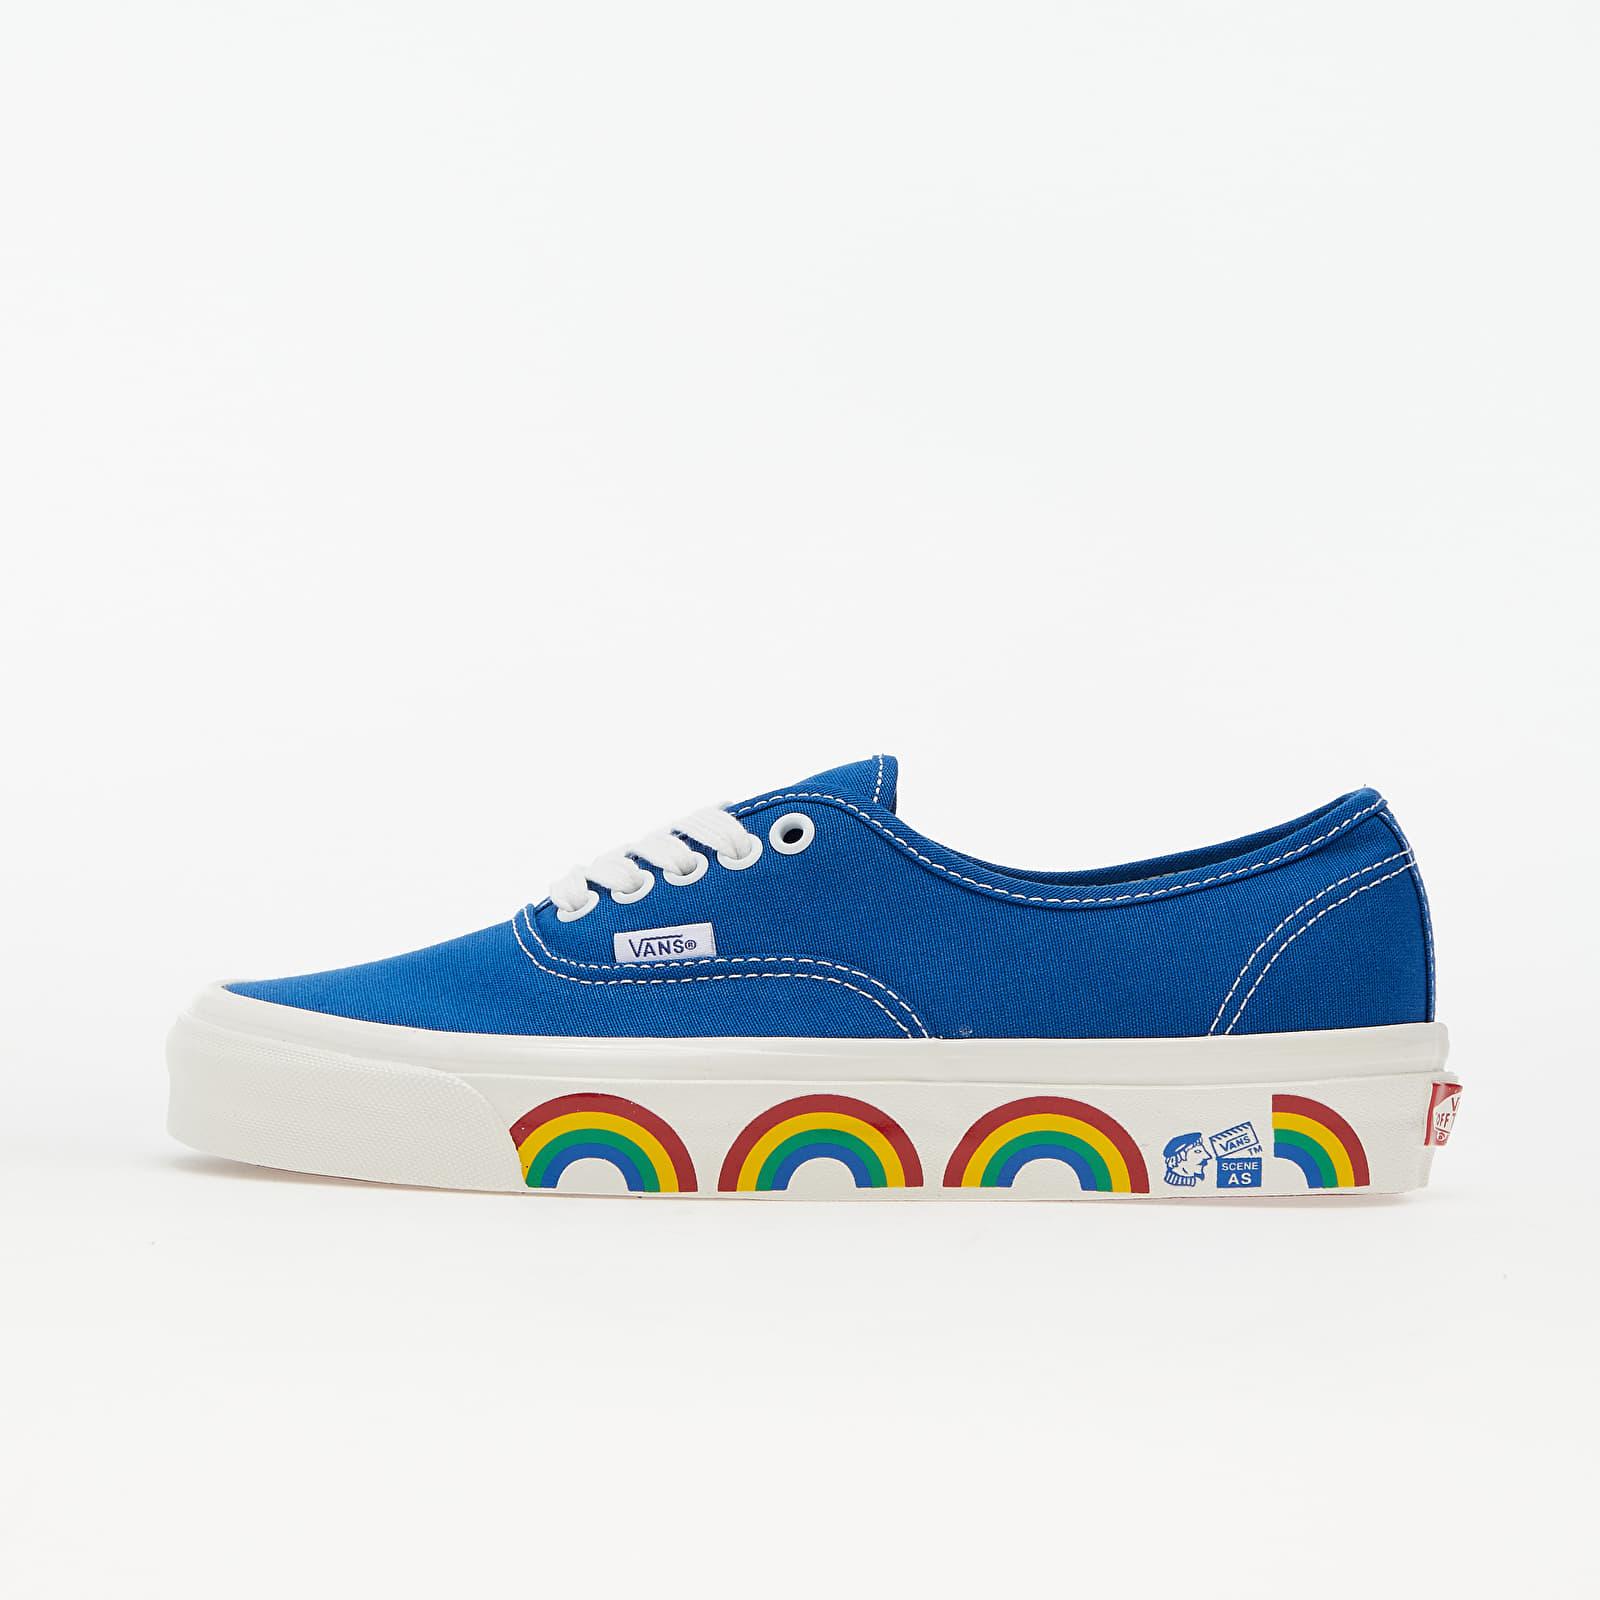 Vans Authentic 44 DX (Anaheim Factory) Og Blue/ Rainbow VN0A54F241D1